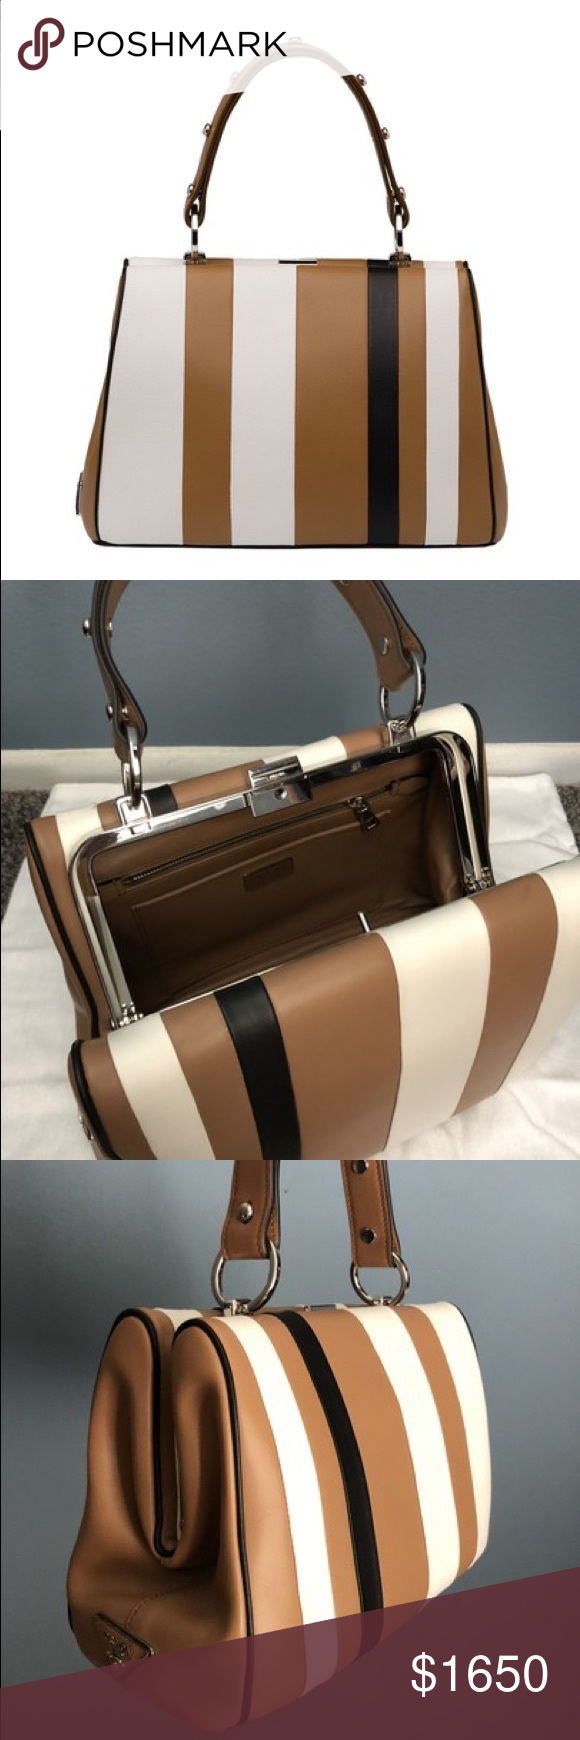 c520cd61a20d Prada Baiadera Arcade-Stripe Frame Satchel Bag Prada Arcade Stripe Frame in  Camel/White/Black (Caramel+bianco+nero) Calfskin Leather S… | My Posh Picks  in ...